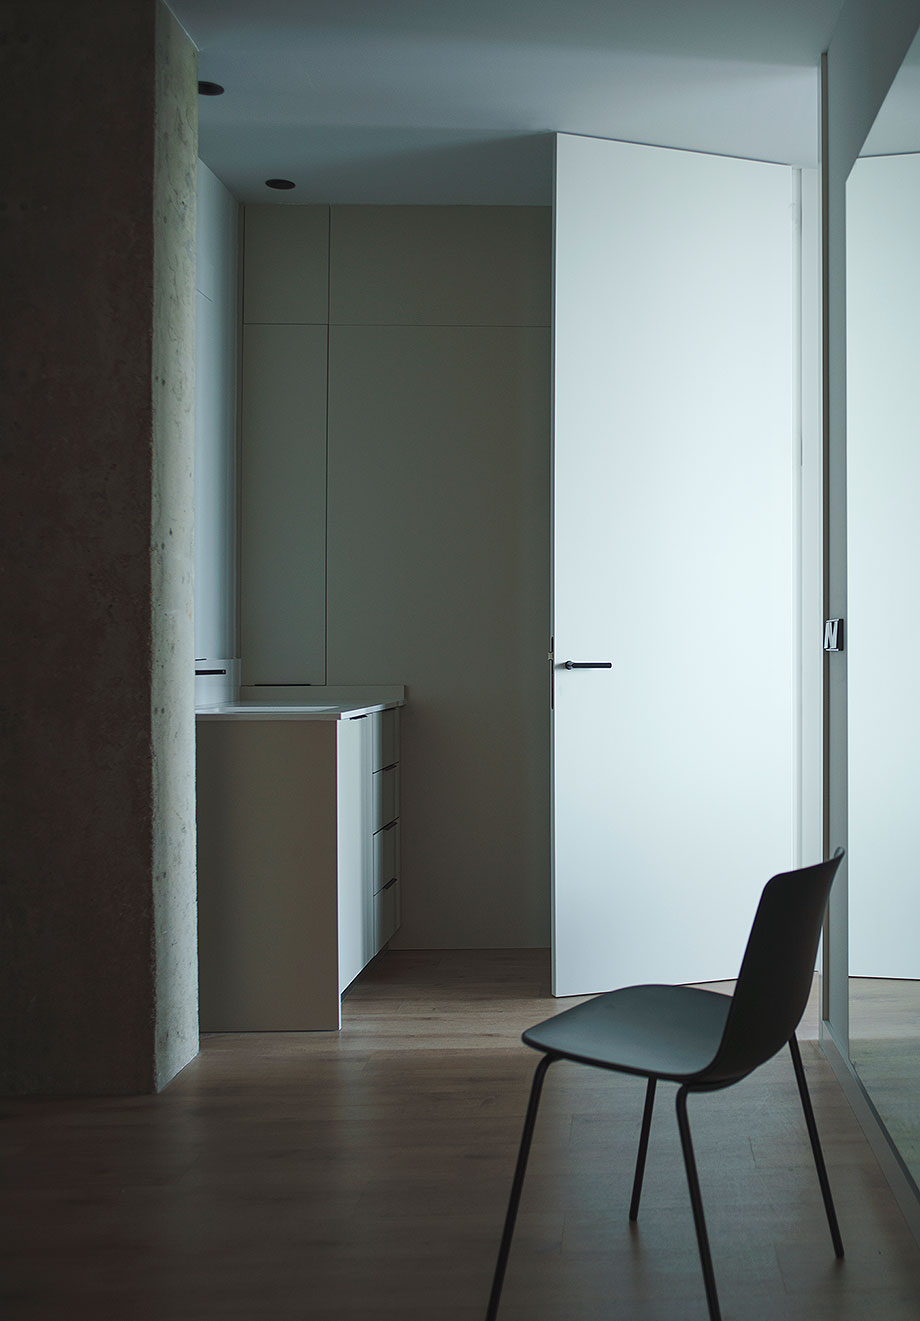 clinica heben de jr arquitectura (11) - foto david zarzoso